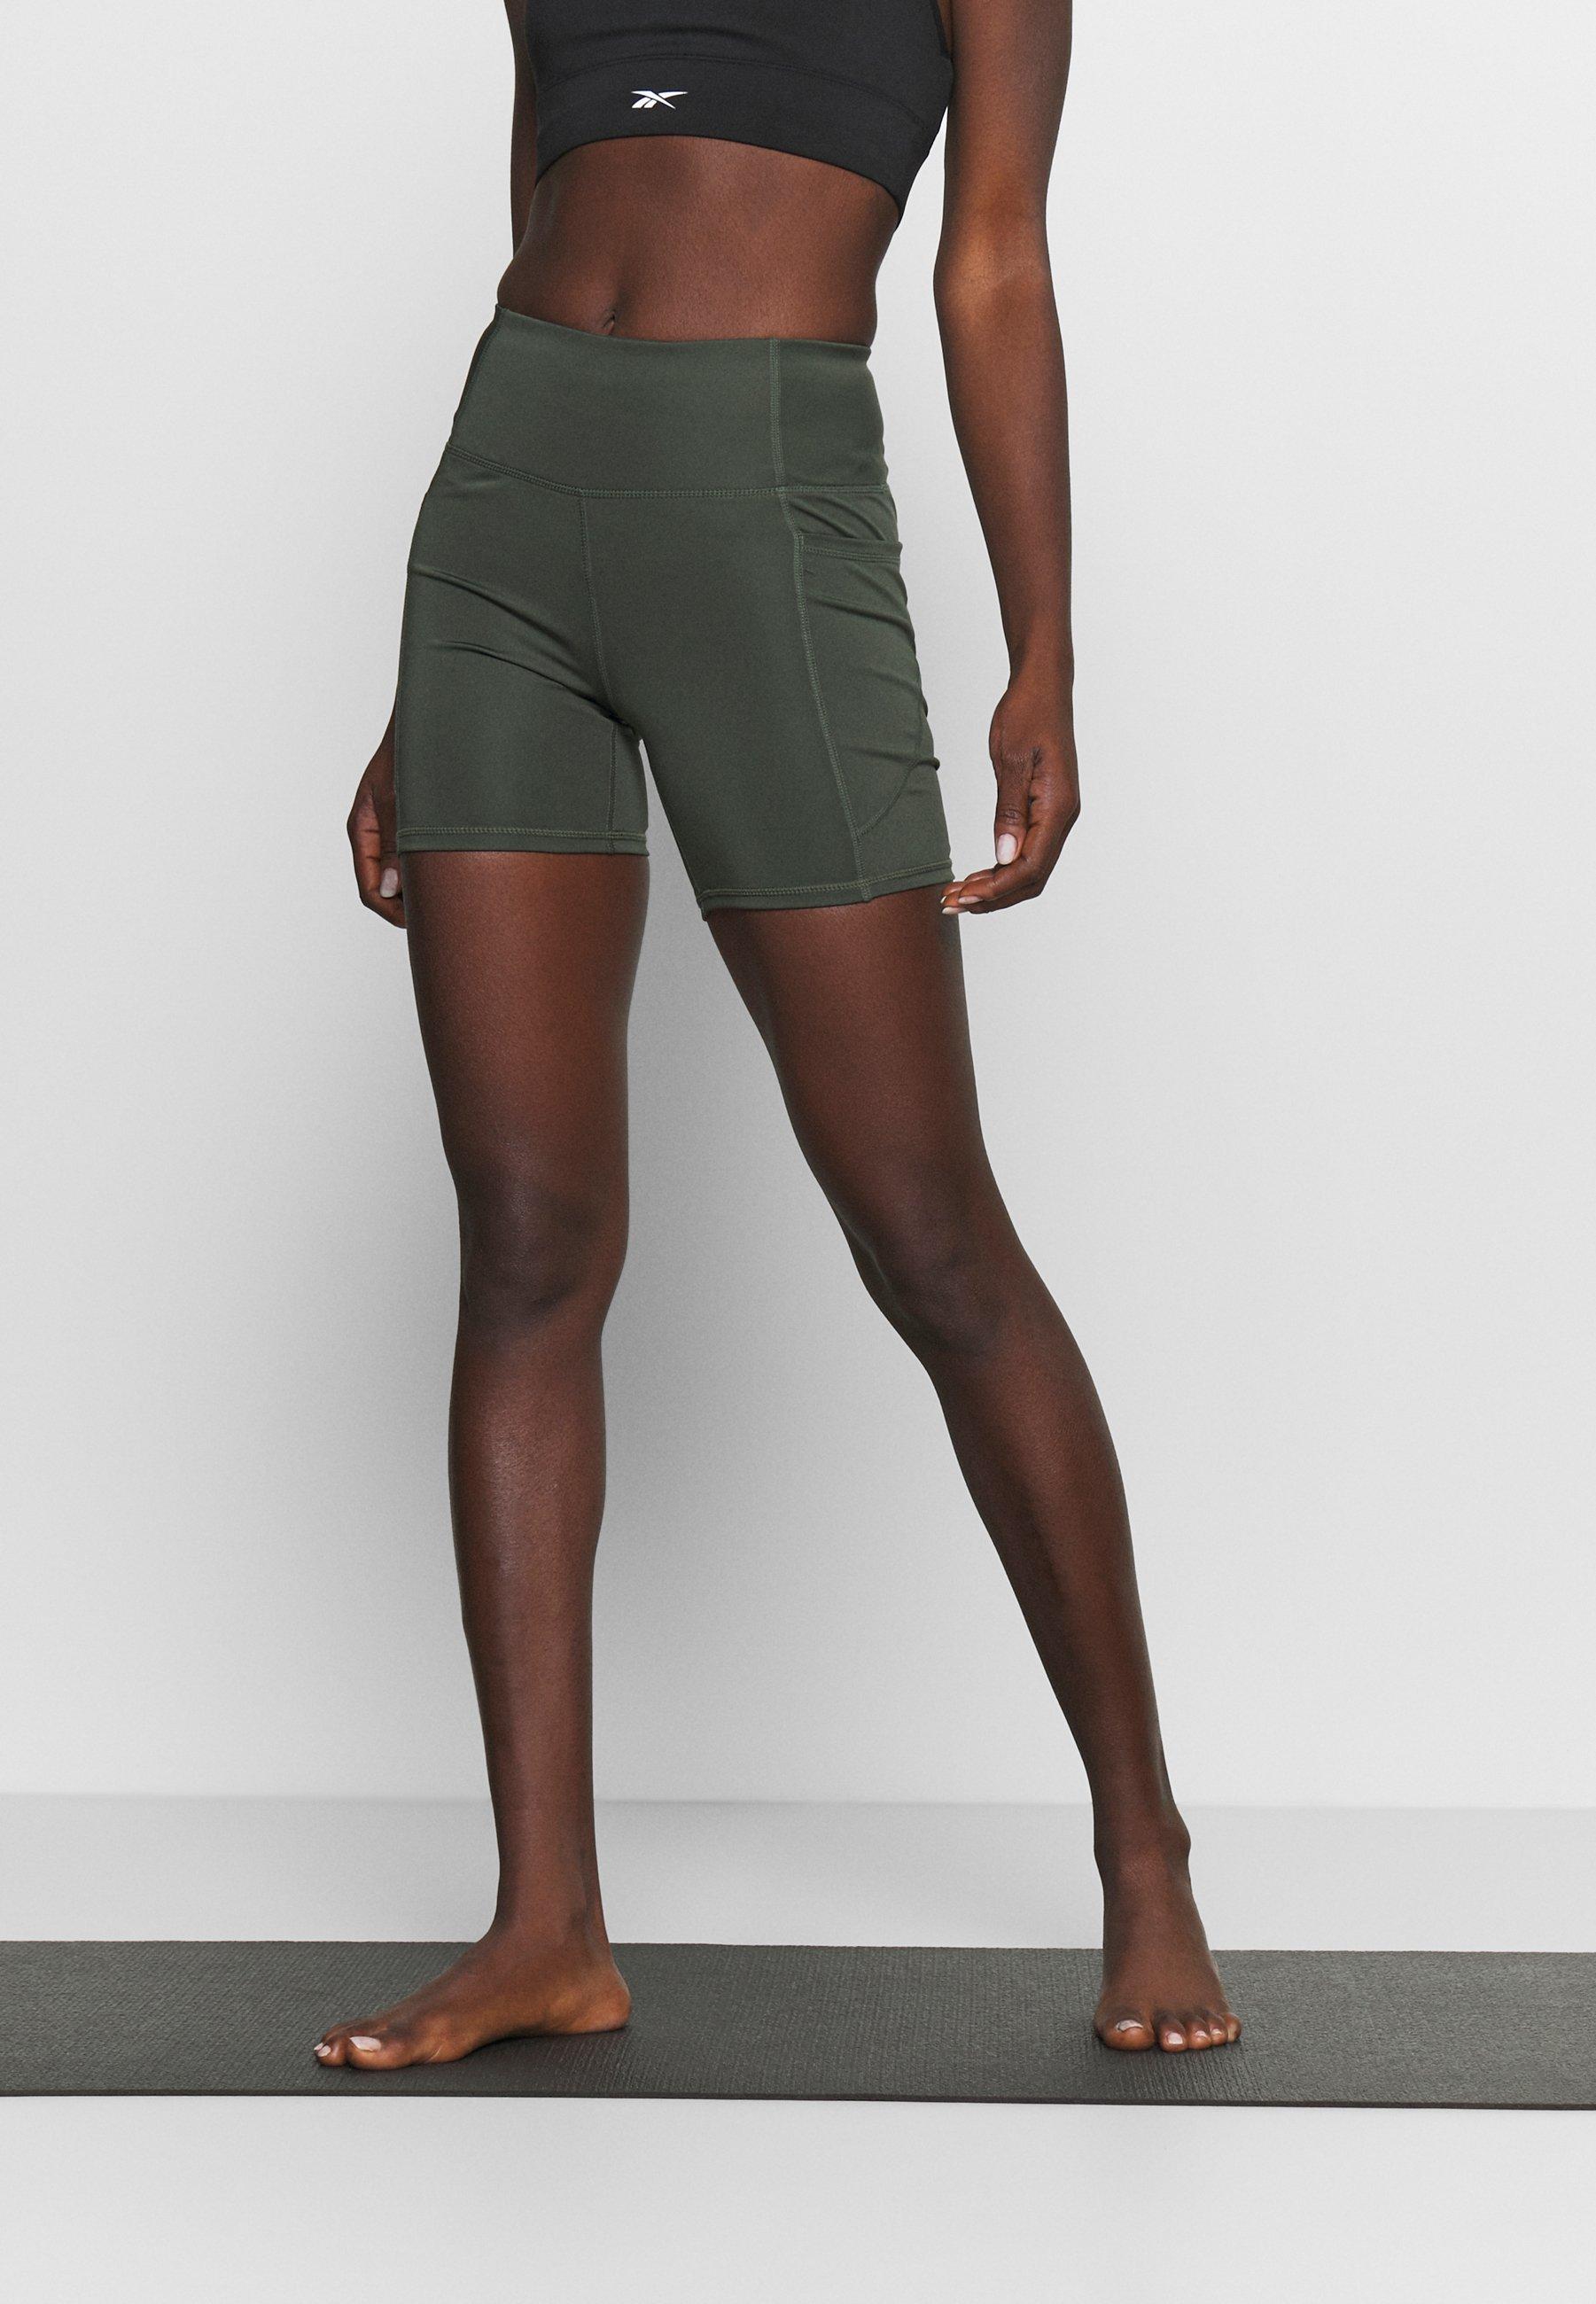 Femme LOVE YOU A LATTE BIKE SHORT - Collants